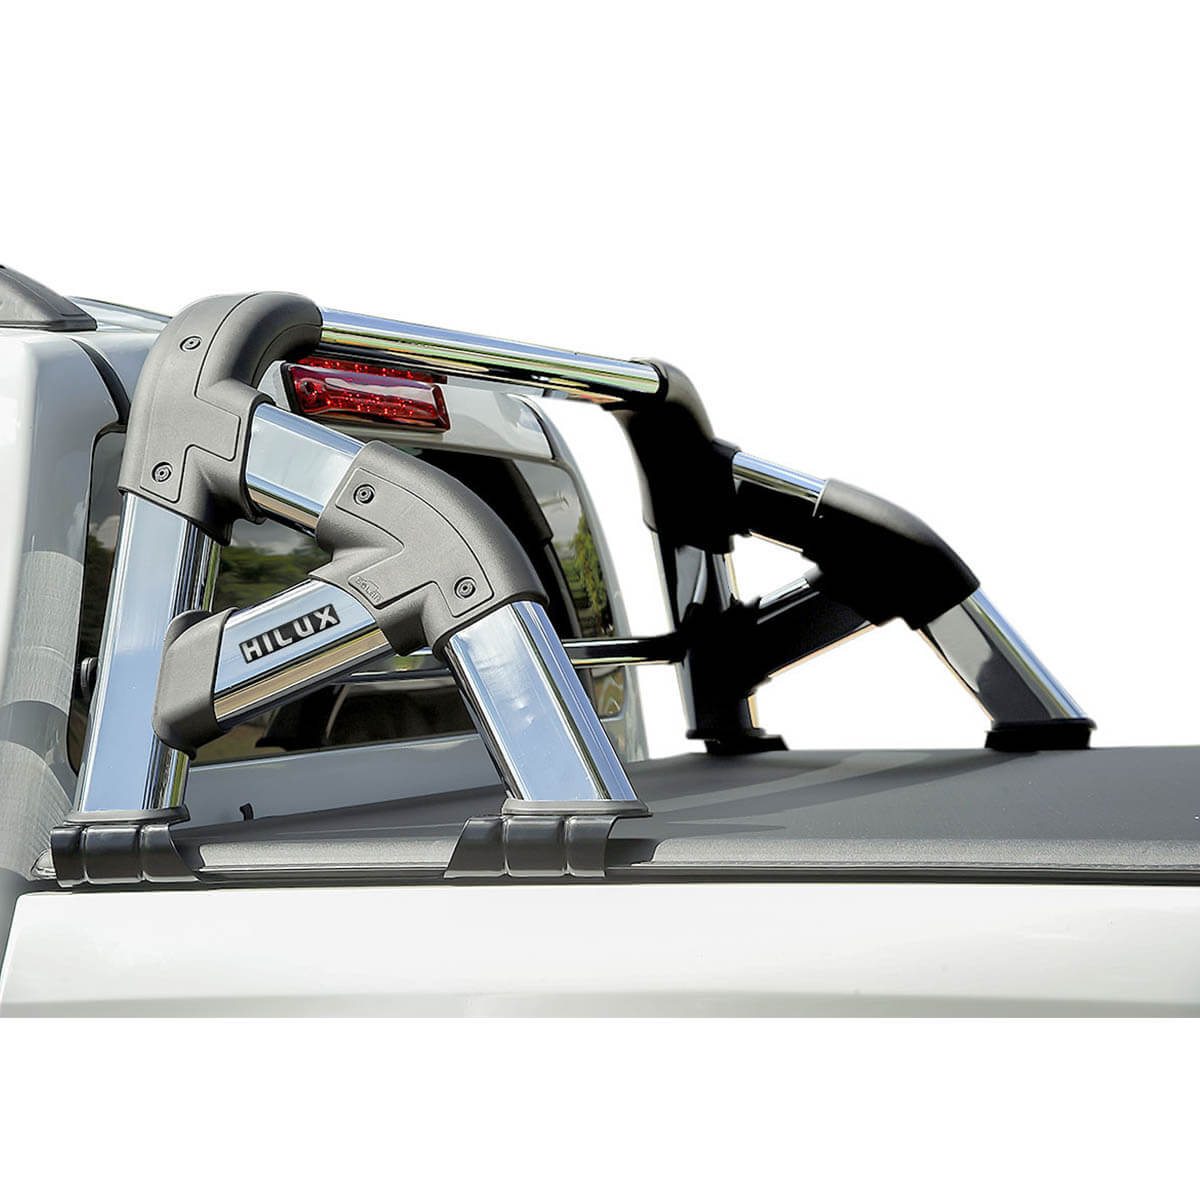 Santo antônio cromado Solar Exclusive Hilux 2005 a 2015 com barra de vidro